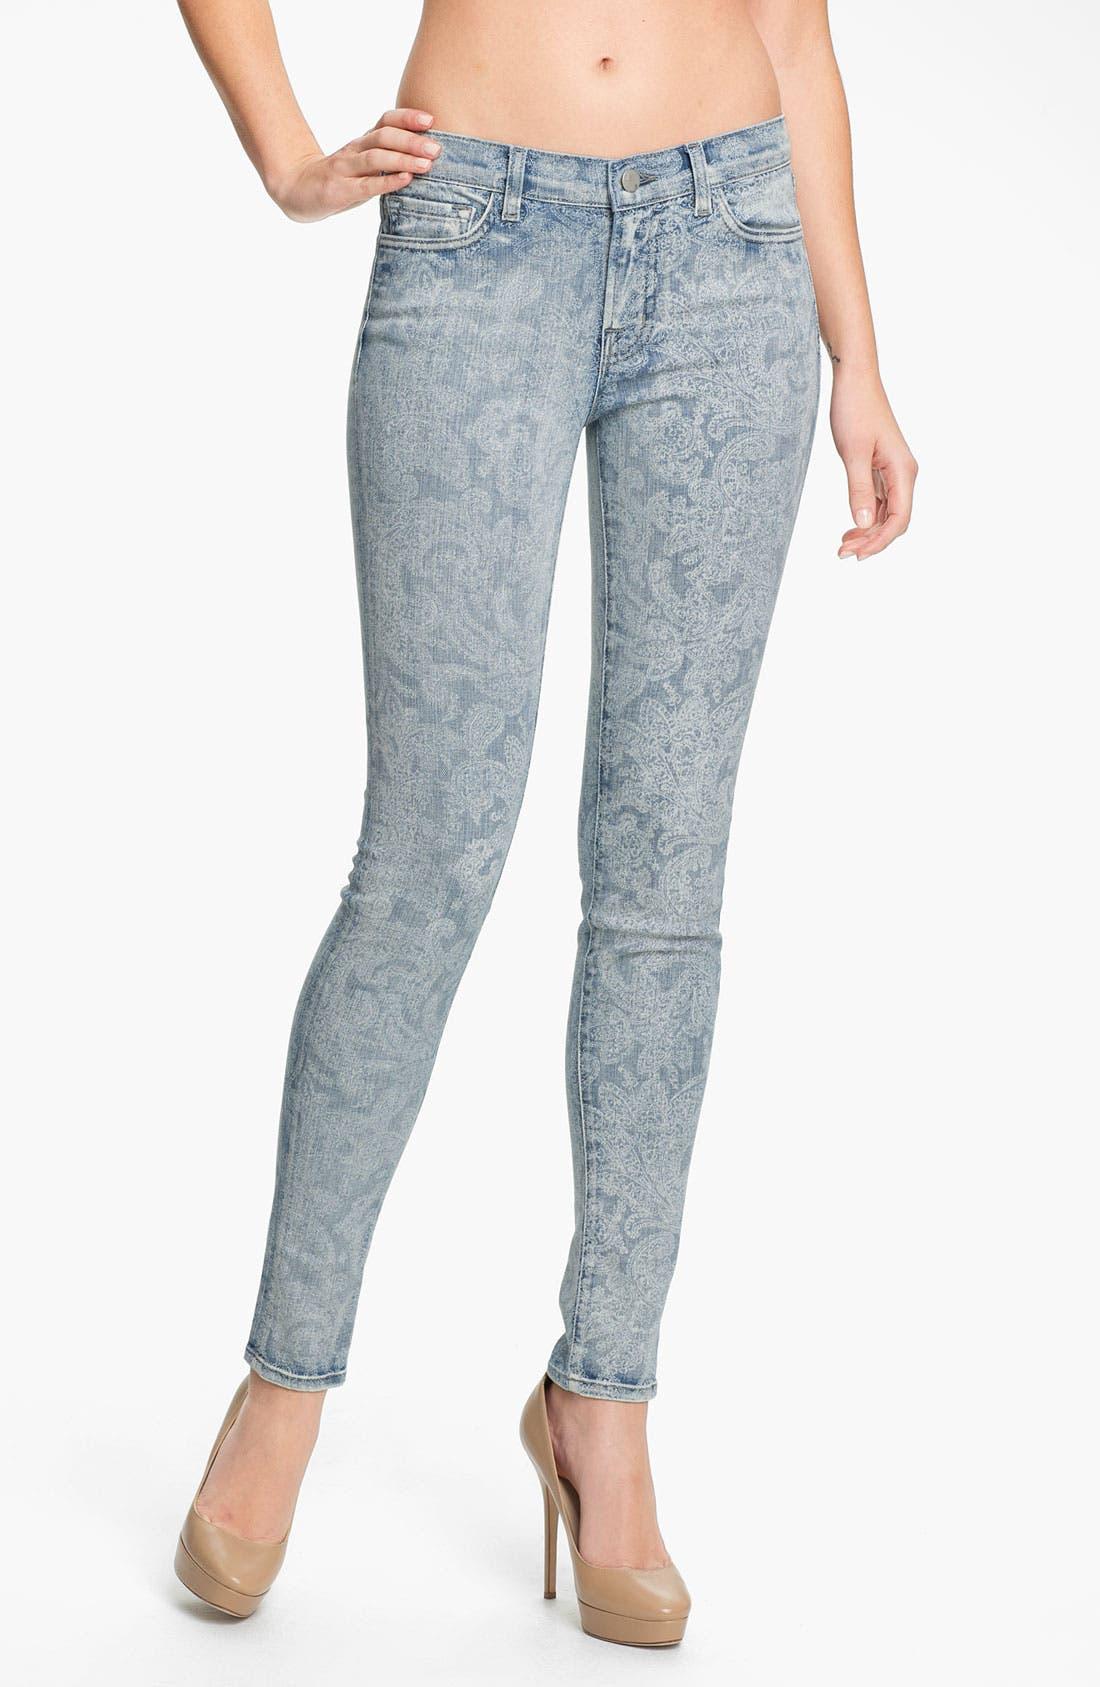 Alternate Image 1 Selected - J Brand Print Skinny Leg Jeans (Vintage Bandana)